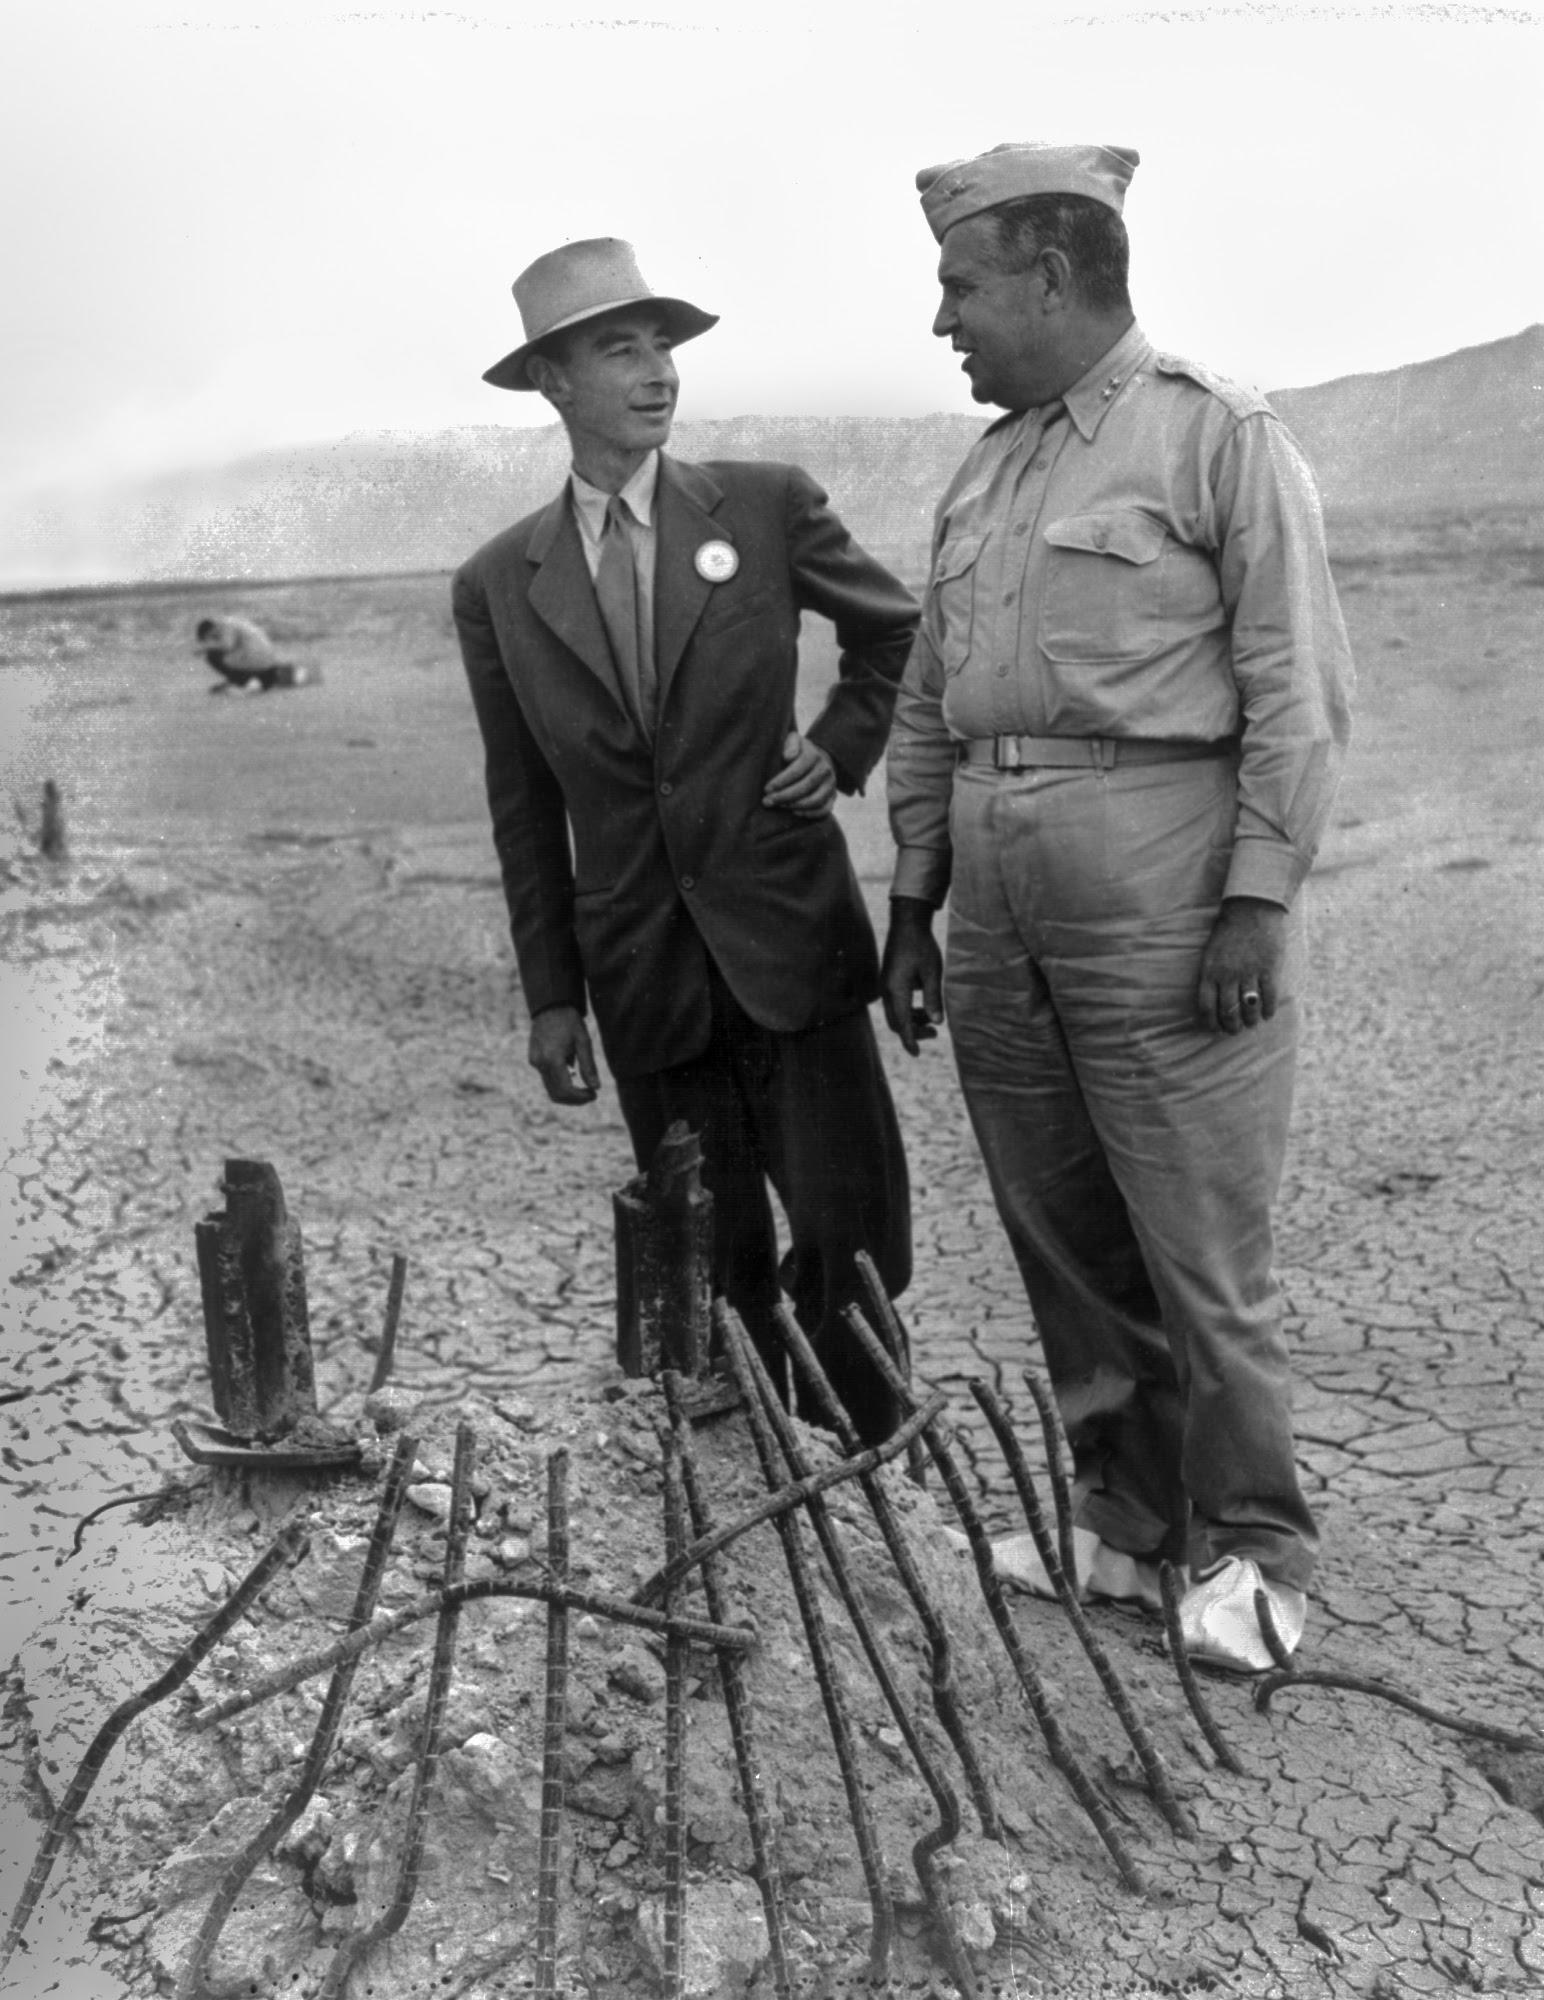 File:Trinity Test - Oppenheimer and Groves at Ground Zero 002.jpg